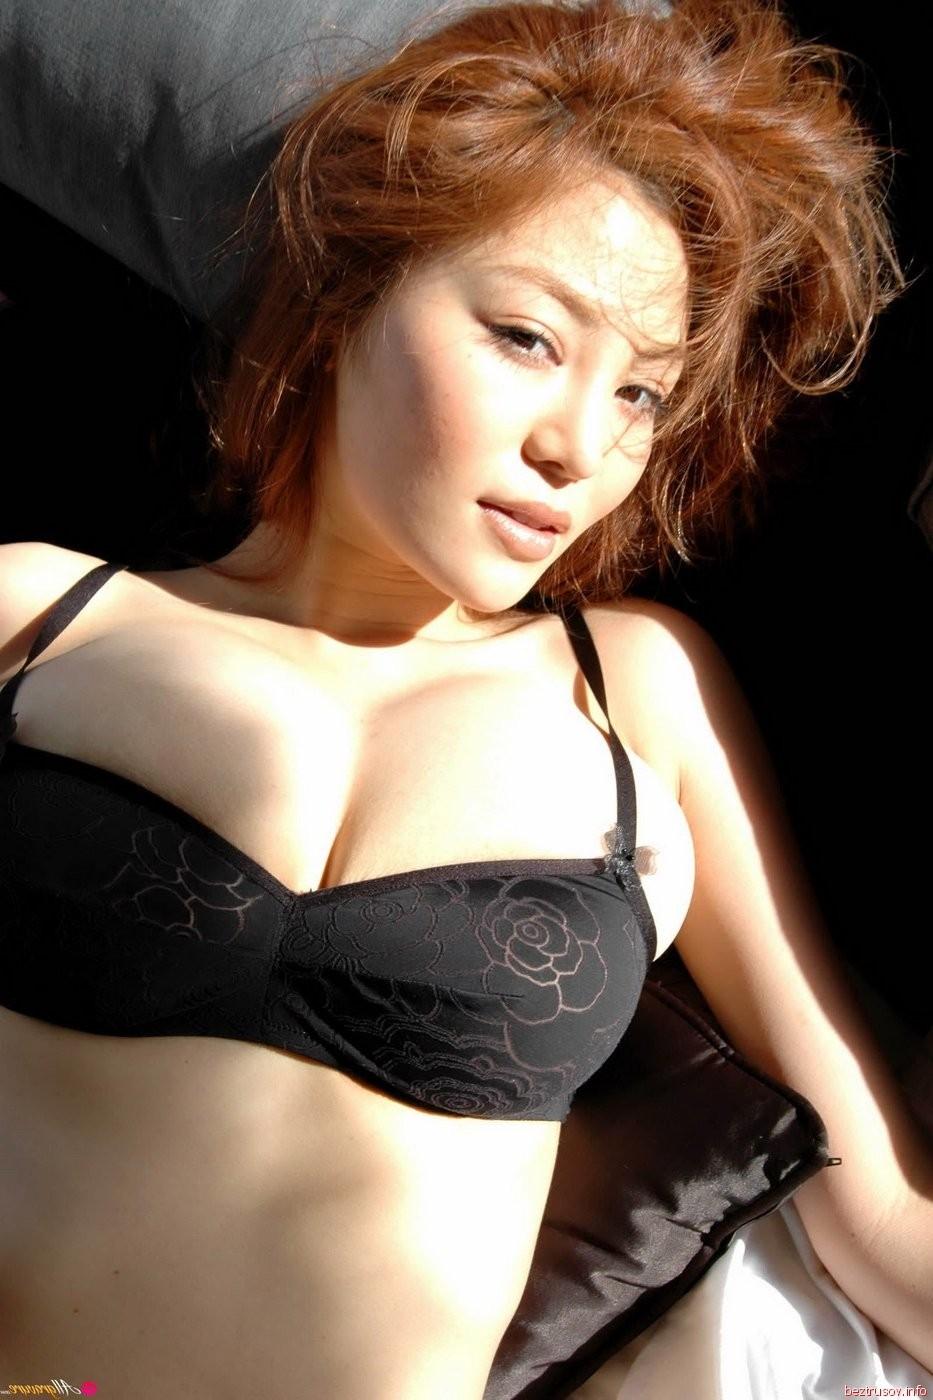 julianna vega pornhub – BDSM